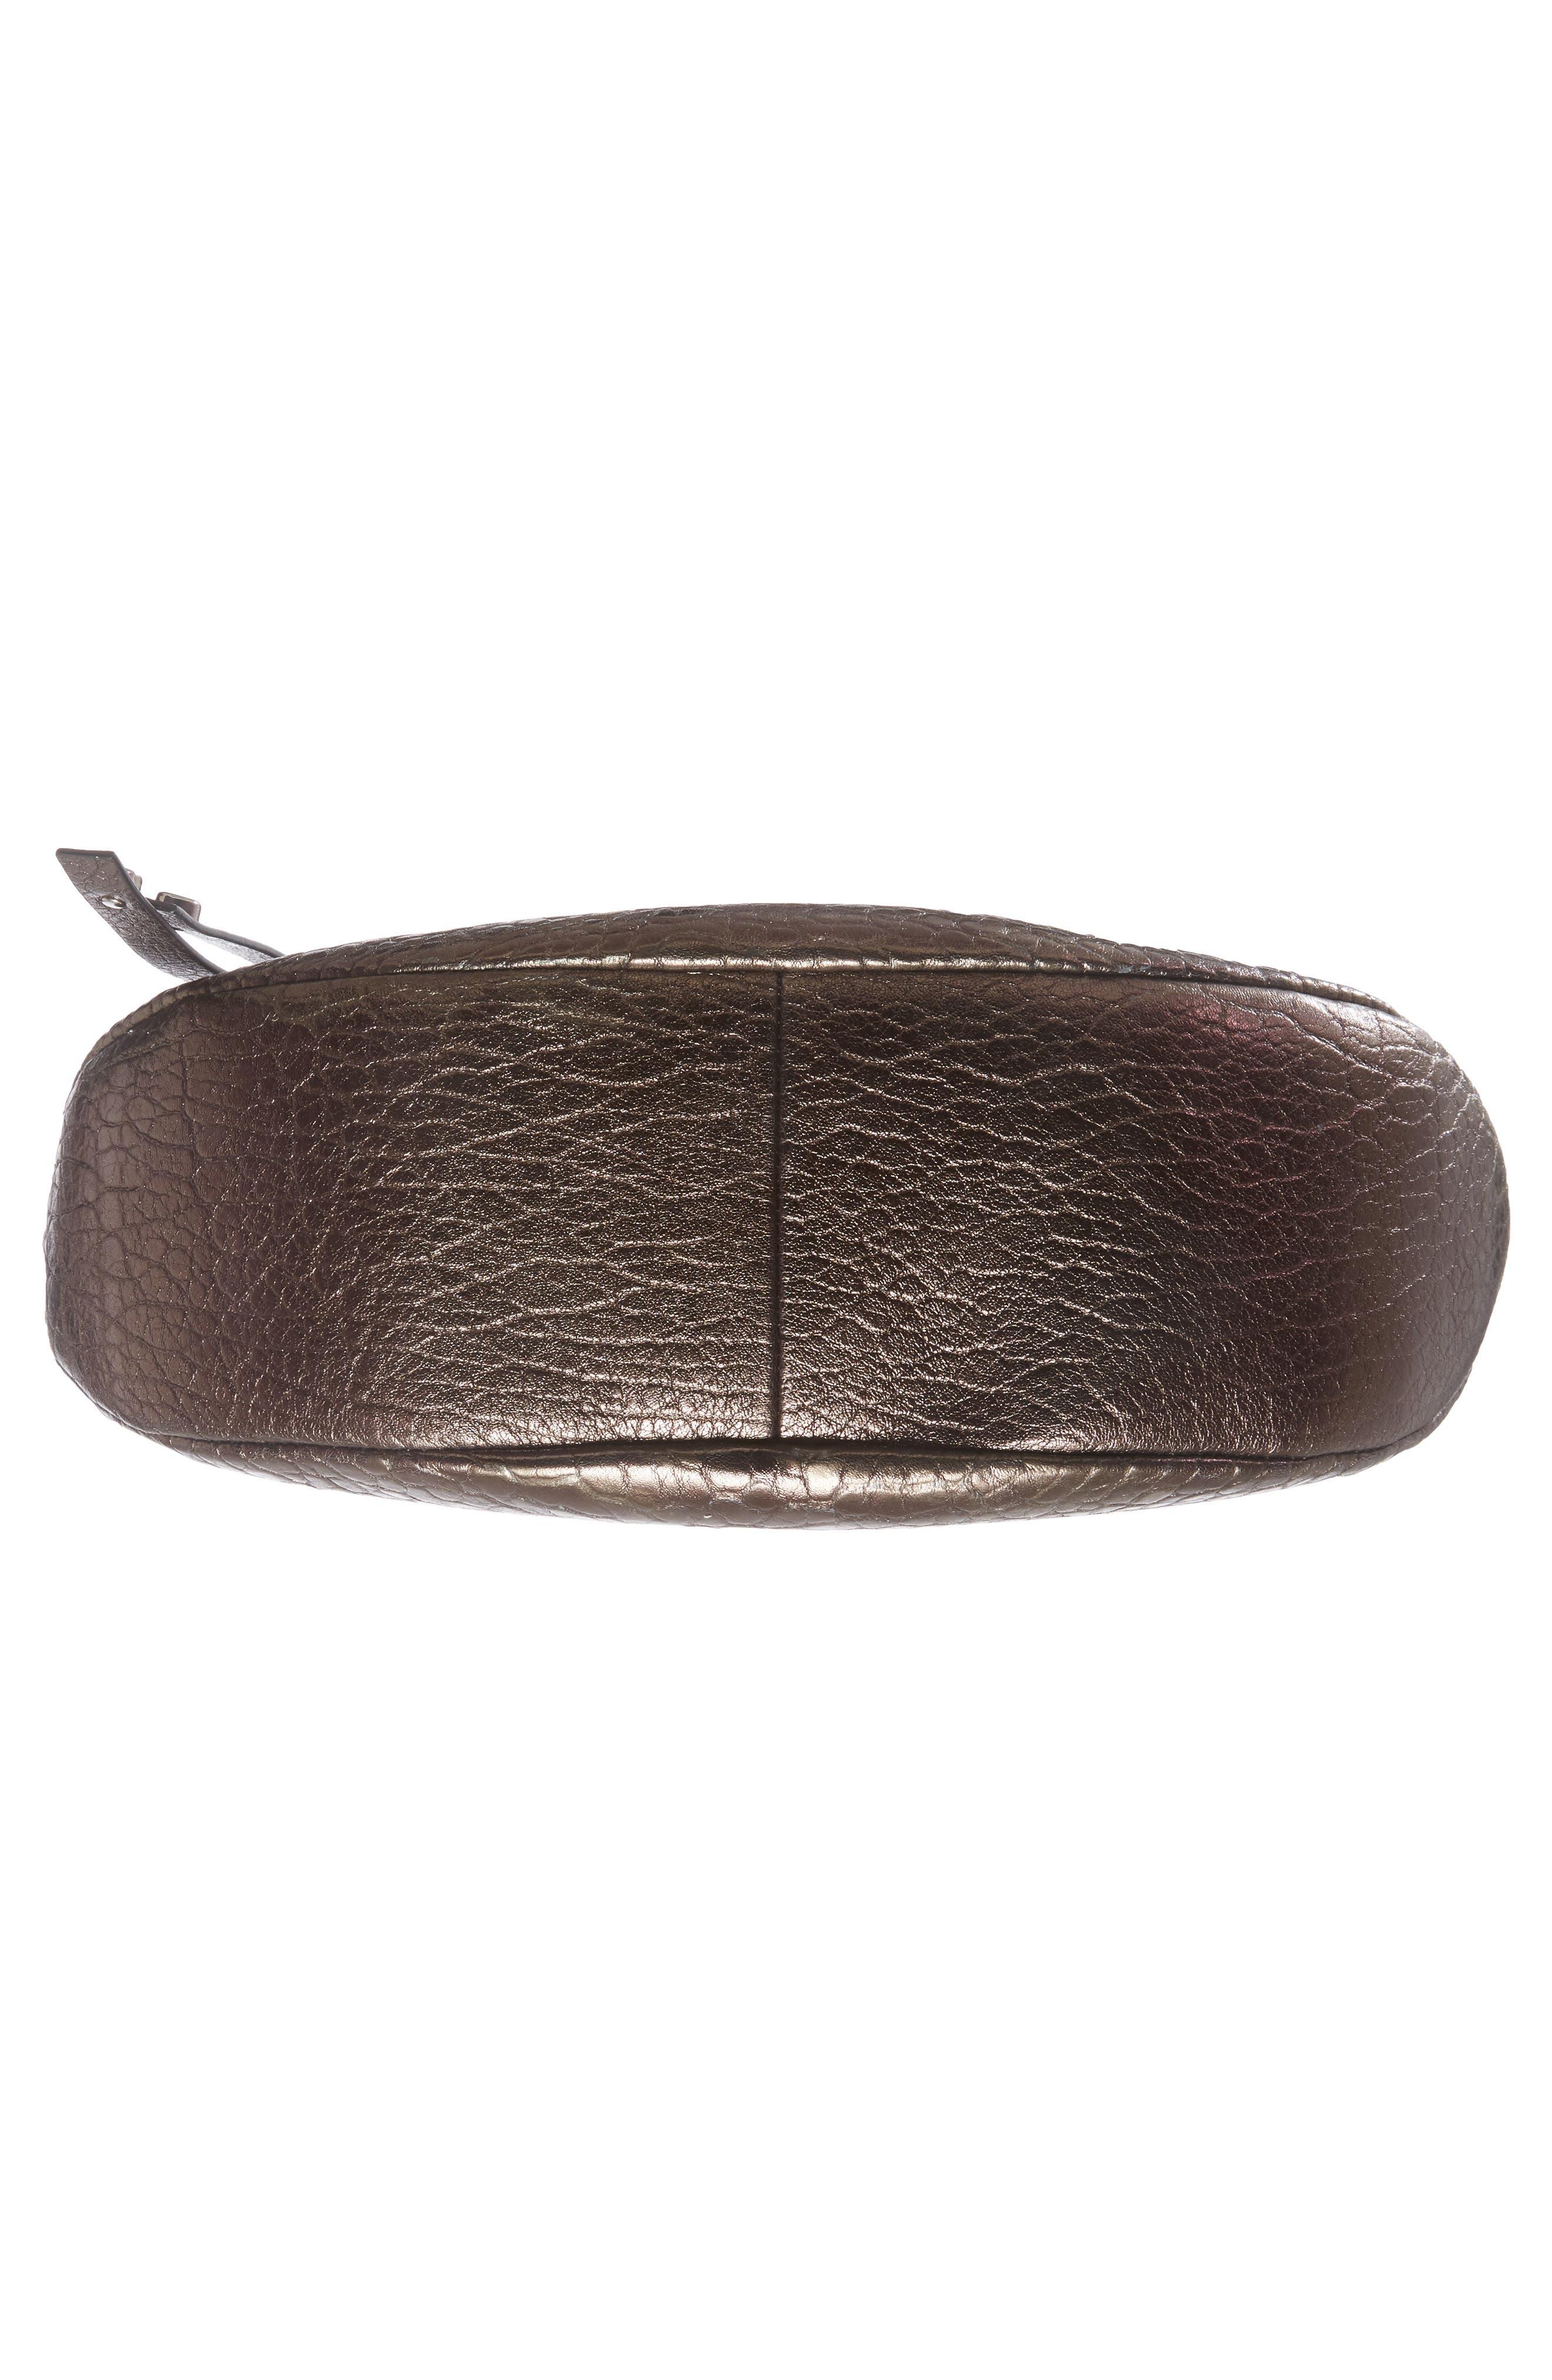 Artie Metallic Leather Hobo Bag,                             Alternate thumbnail 6, color,                             200